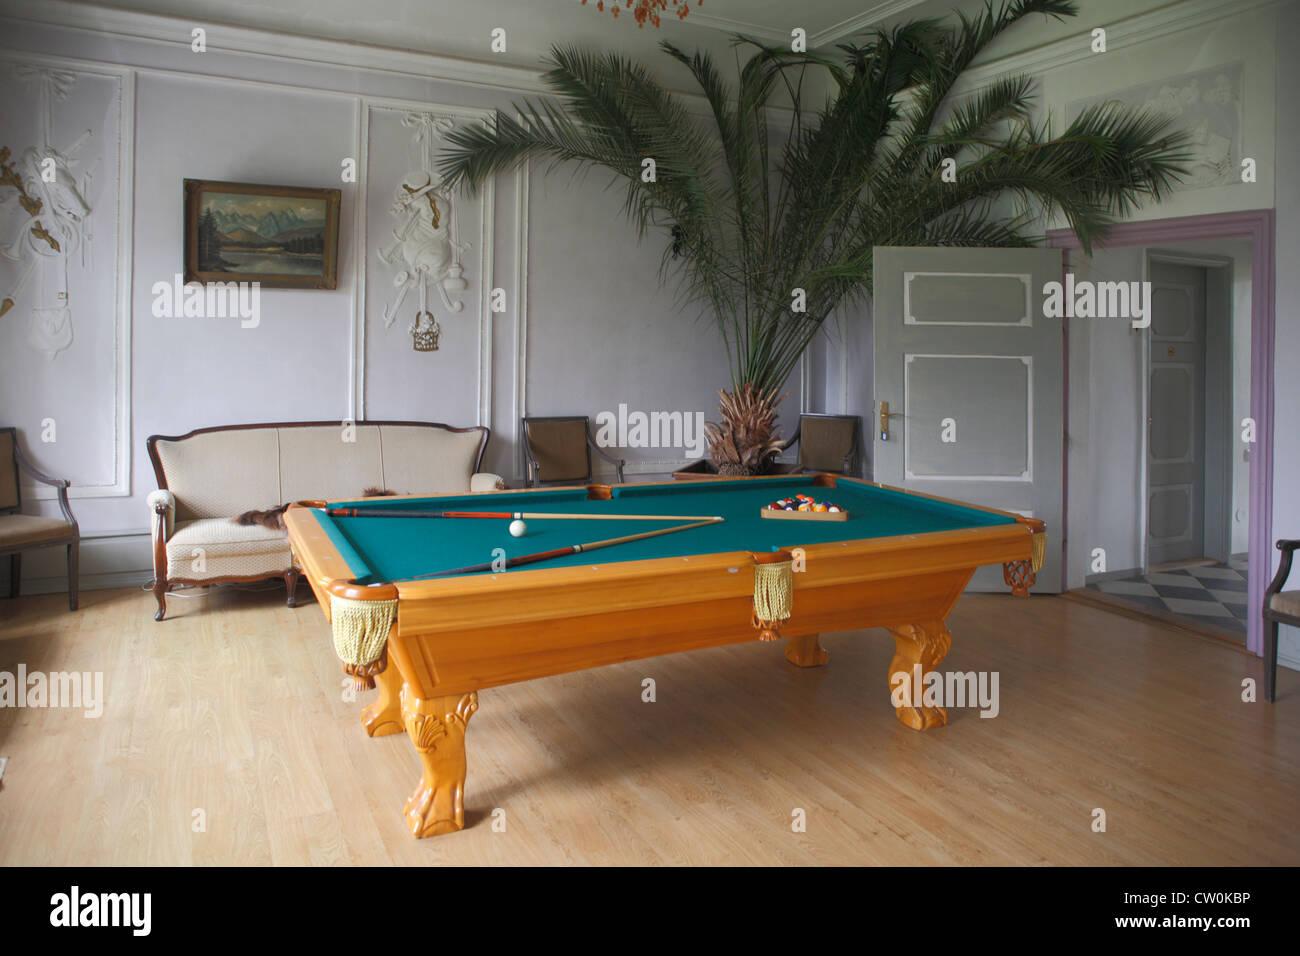 Estonia Tallinn, Sauer manor, billiards room - Stock Image